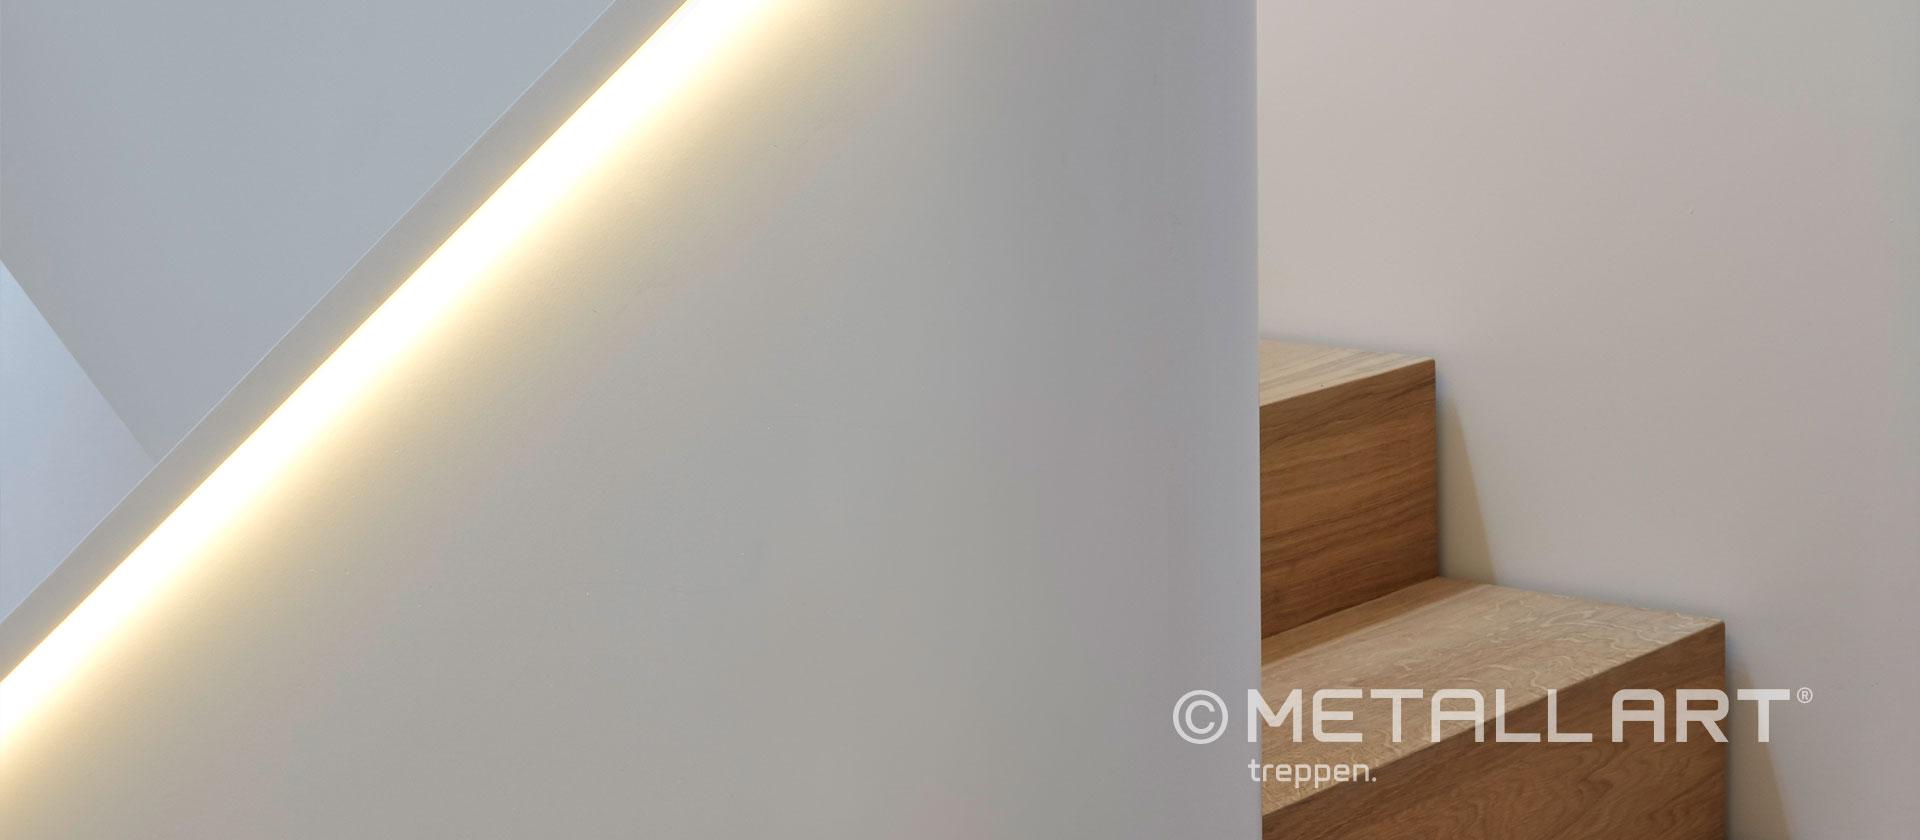 Gewendelte Treppe LED Beleuchtung grazil